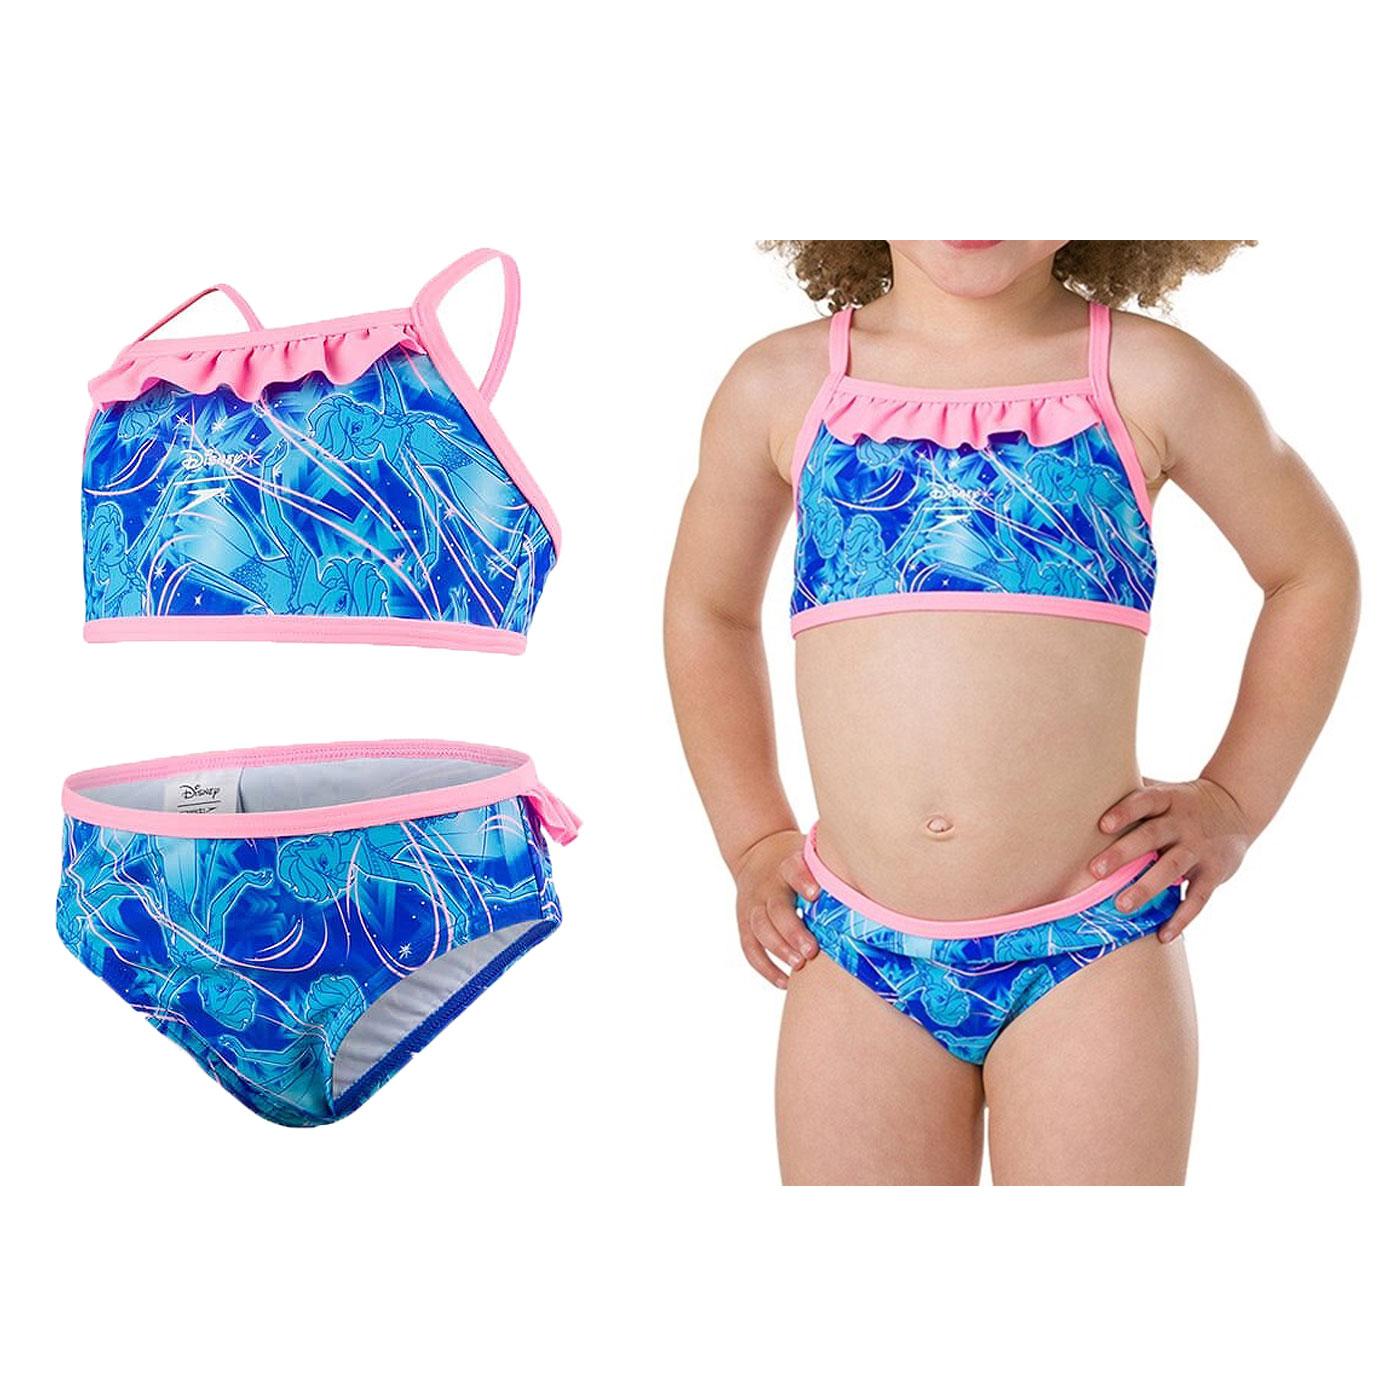 SPEEDO 女童休閒兩截式泳裝-冰雪奇緣 SD807971C783